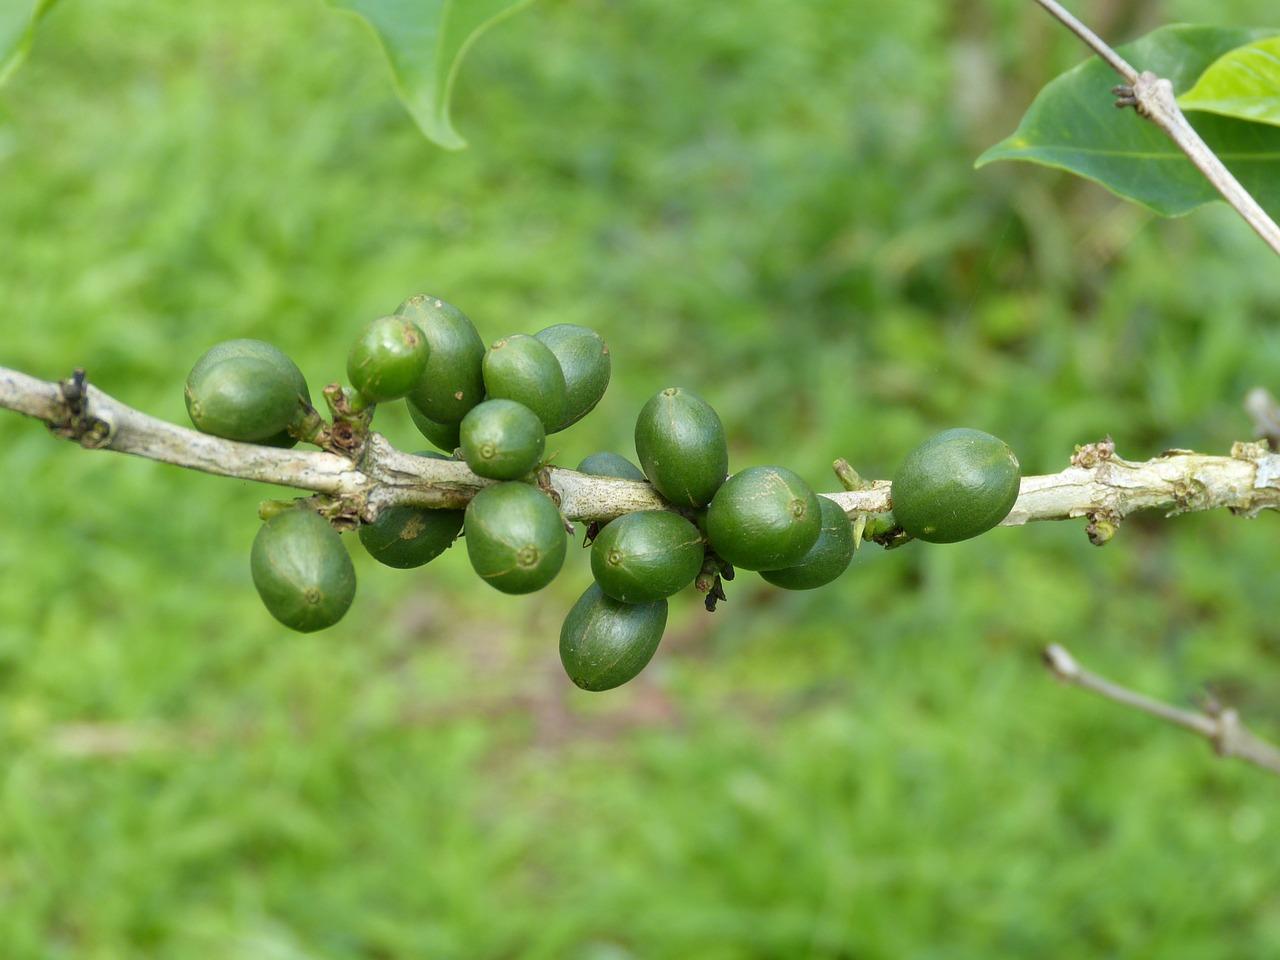 coffee-beans-280732_1280 (1)